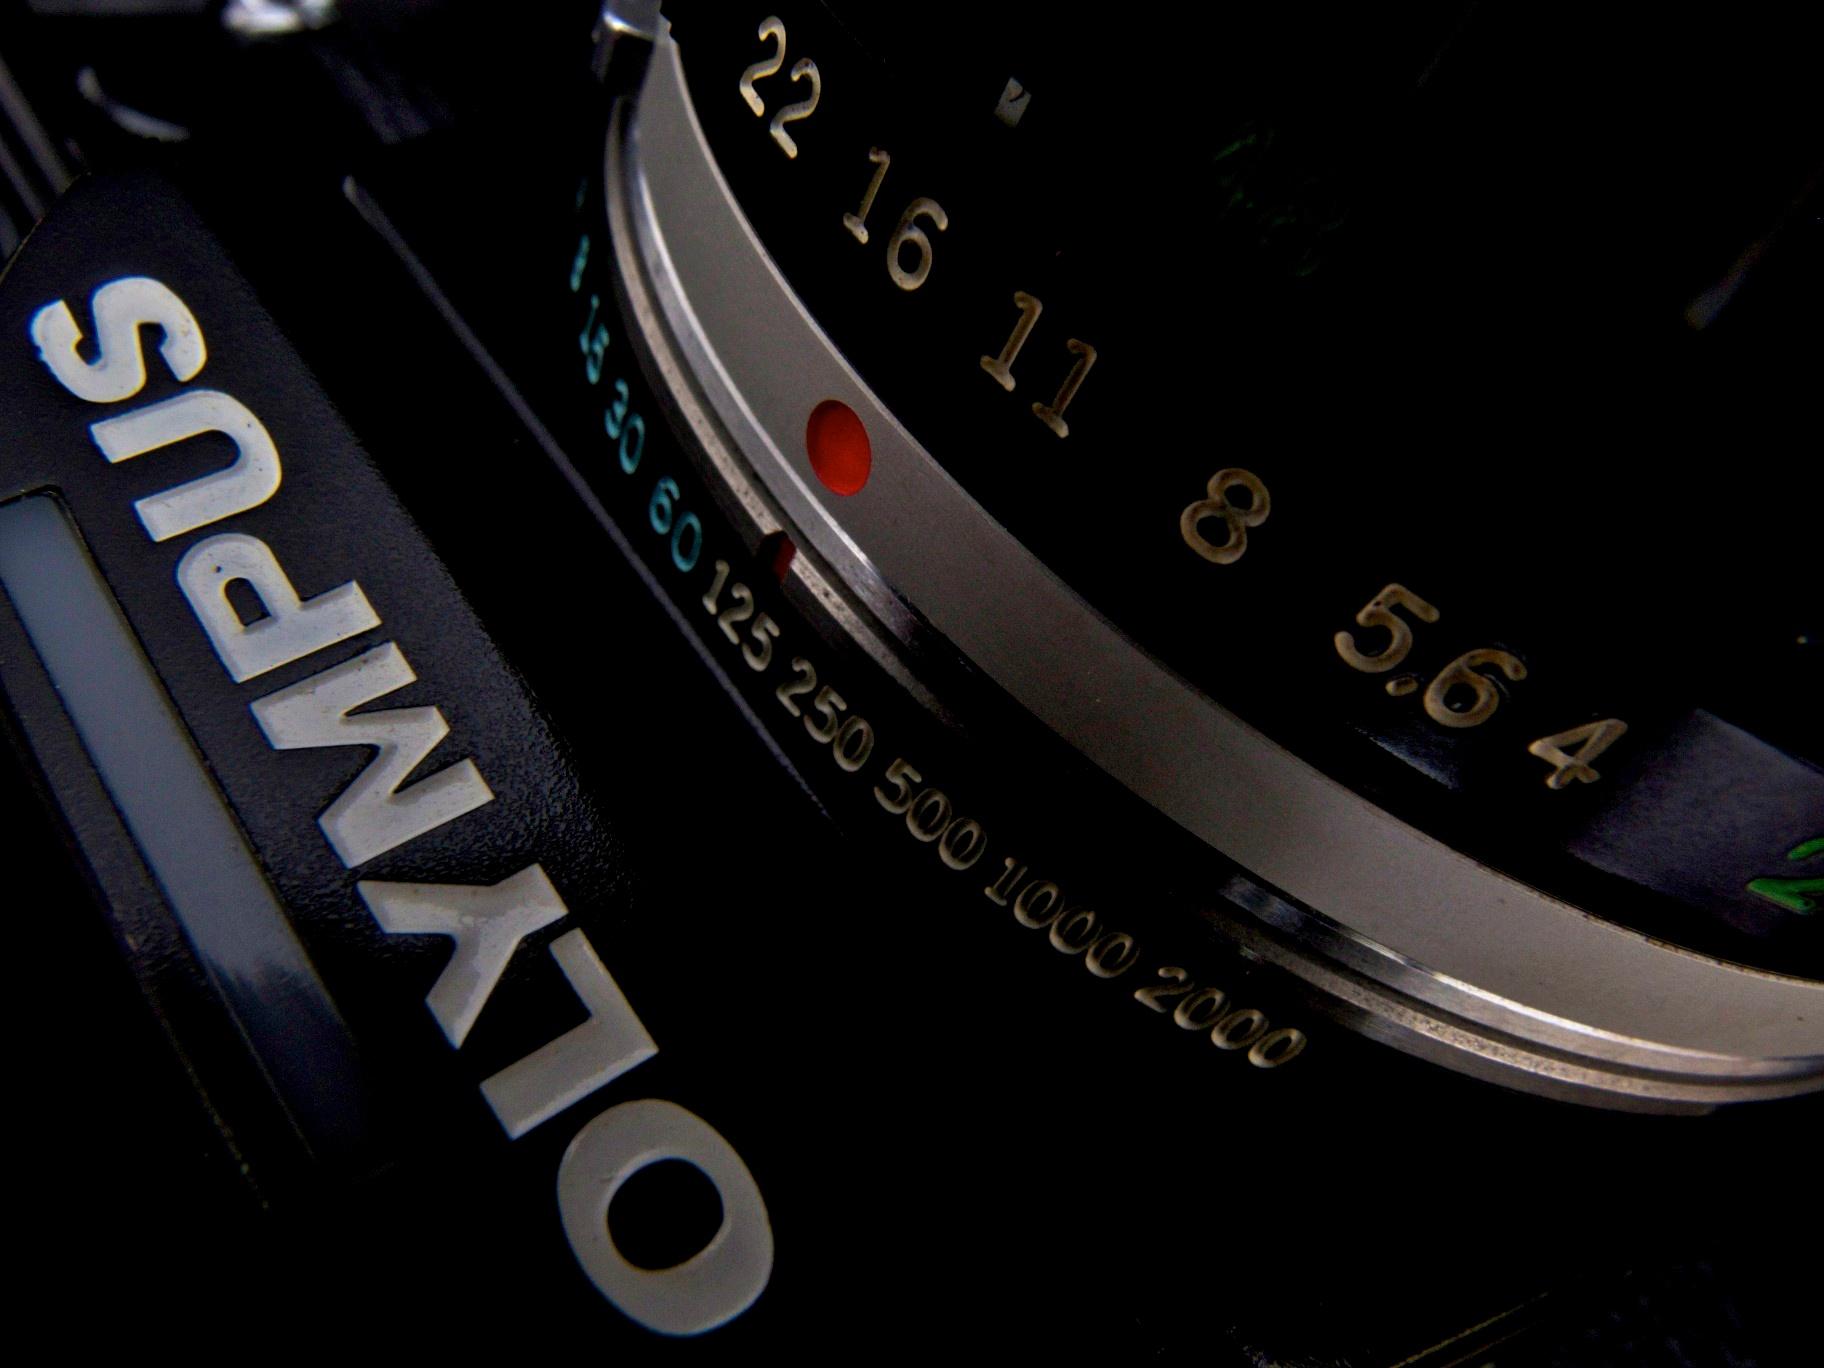 No.1184085 (ca.1998-9 Singapore) with S Zuiko Auto-Zoom 28-48mm f4